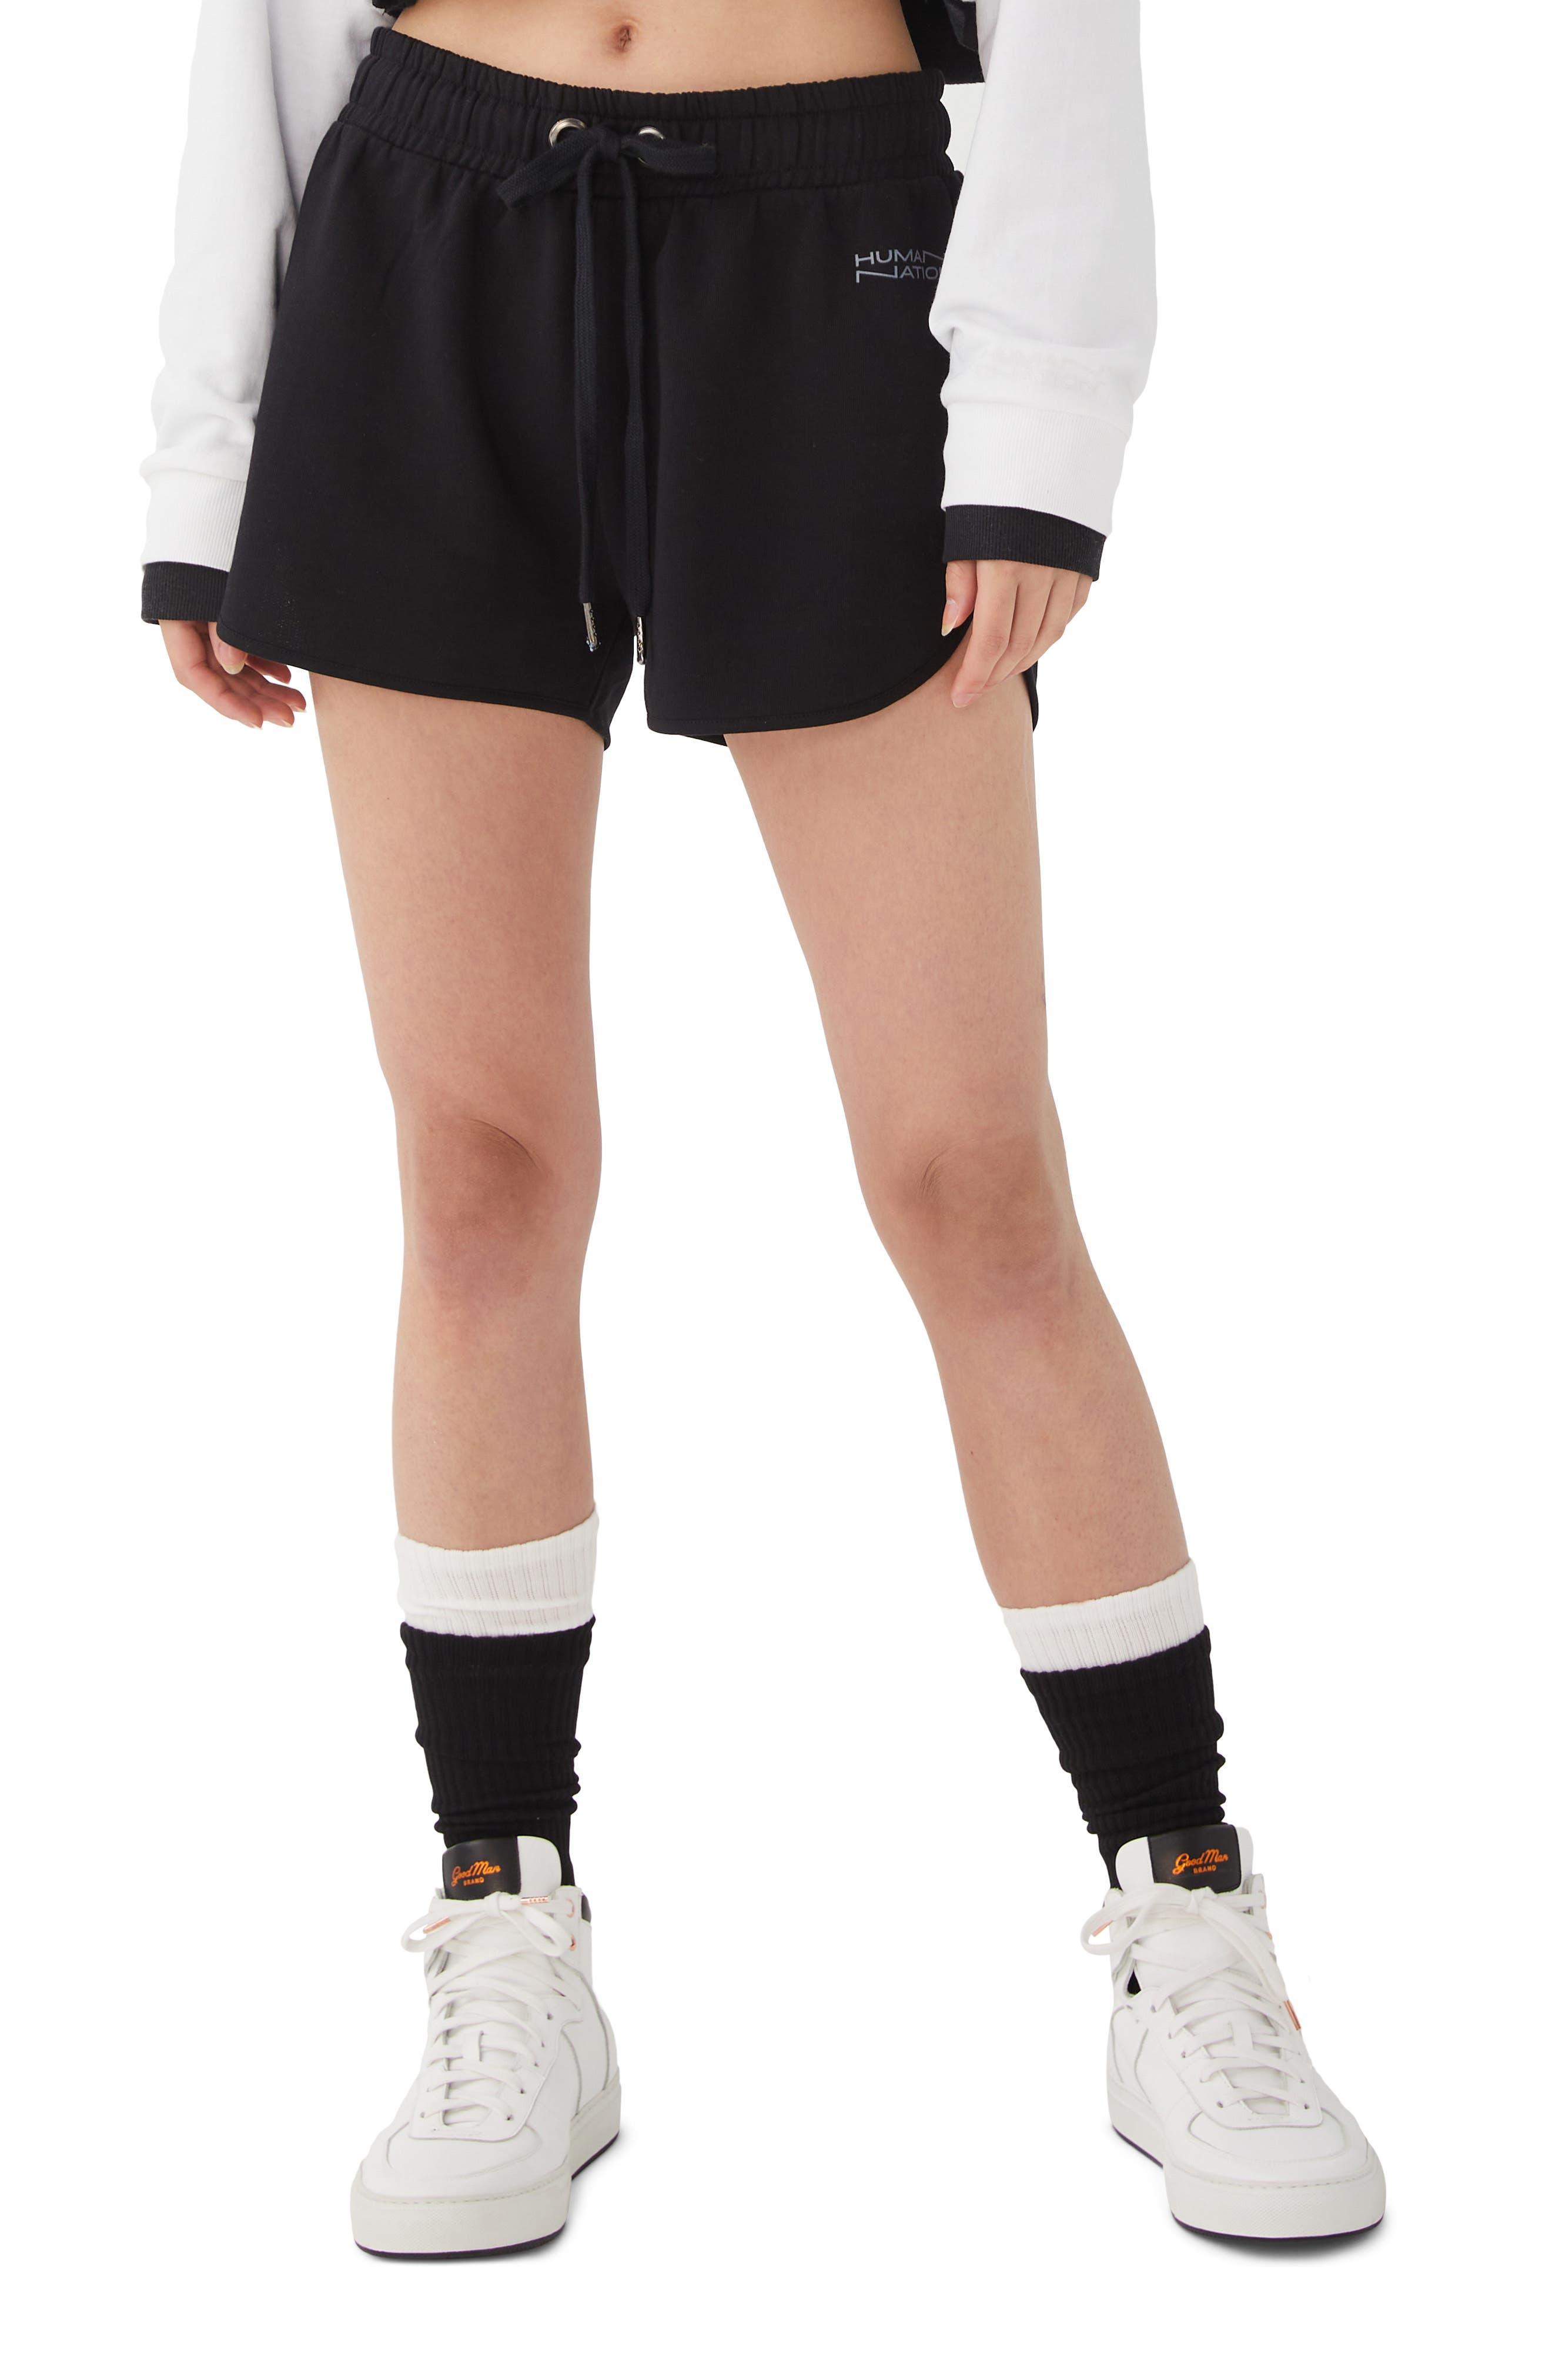 Gender Inclusive Organic Cotton Blend Shorts